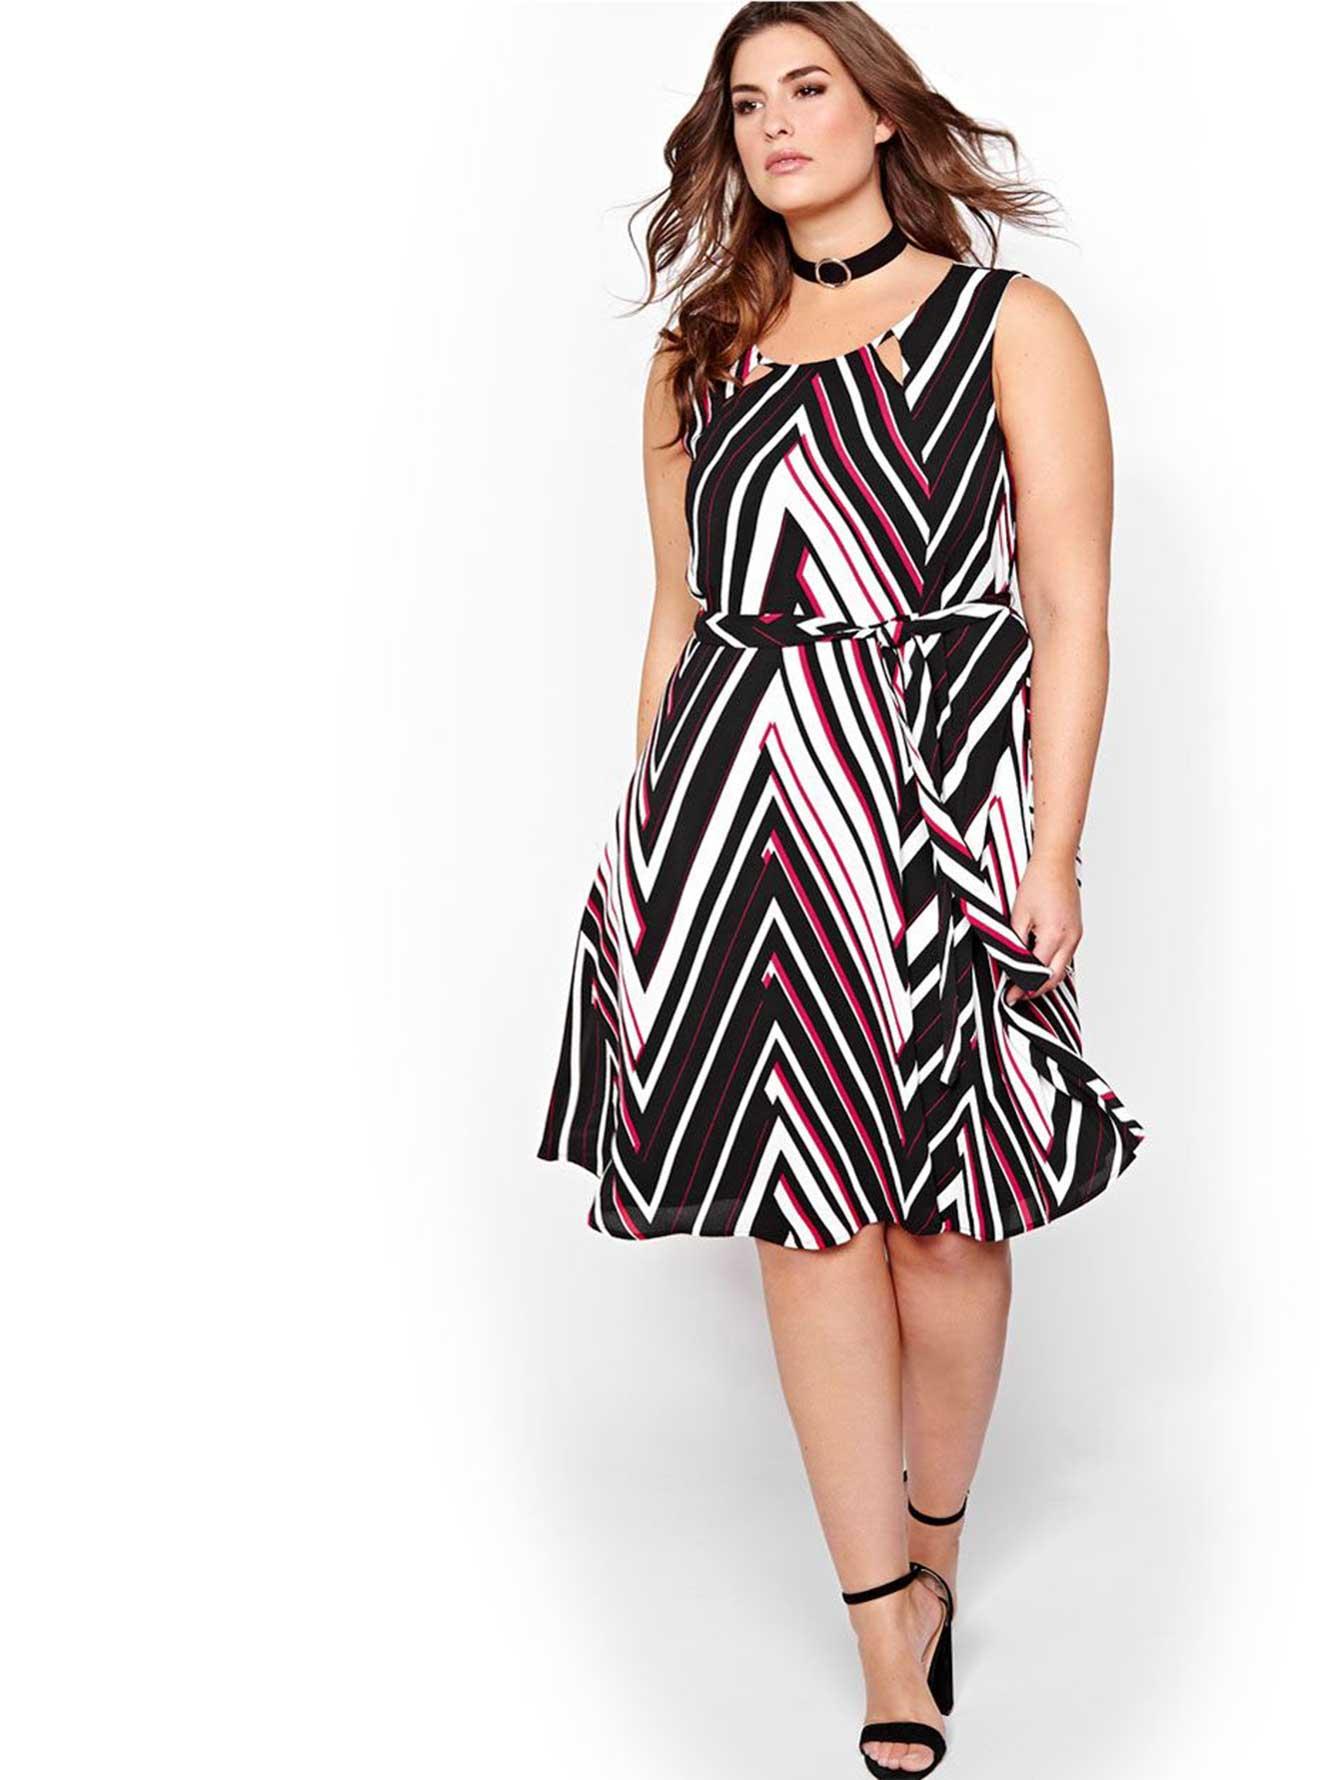 8577f26405 Fashionable & Trendy Plus Size Clothing   Addition Elle